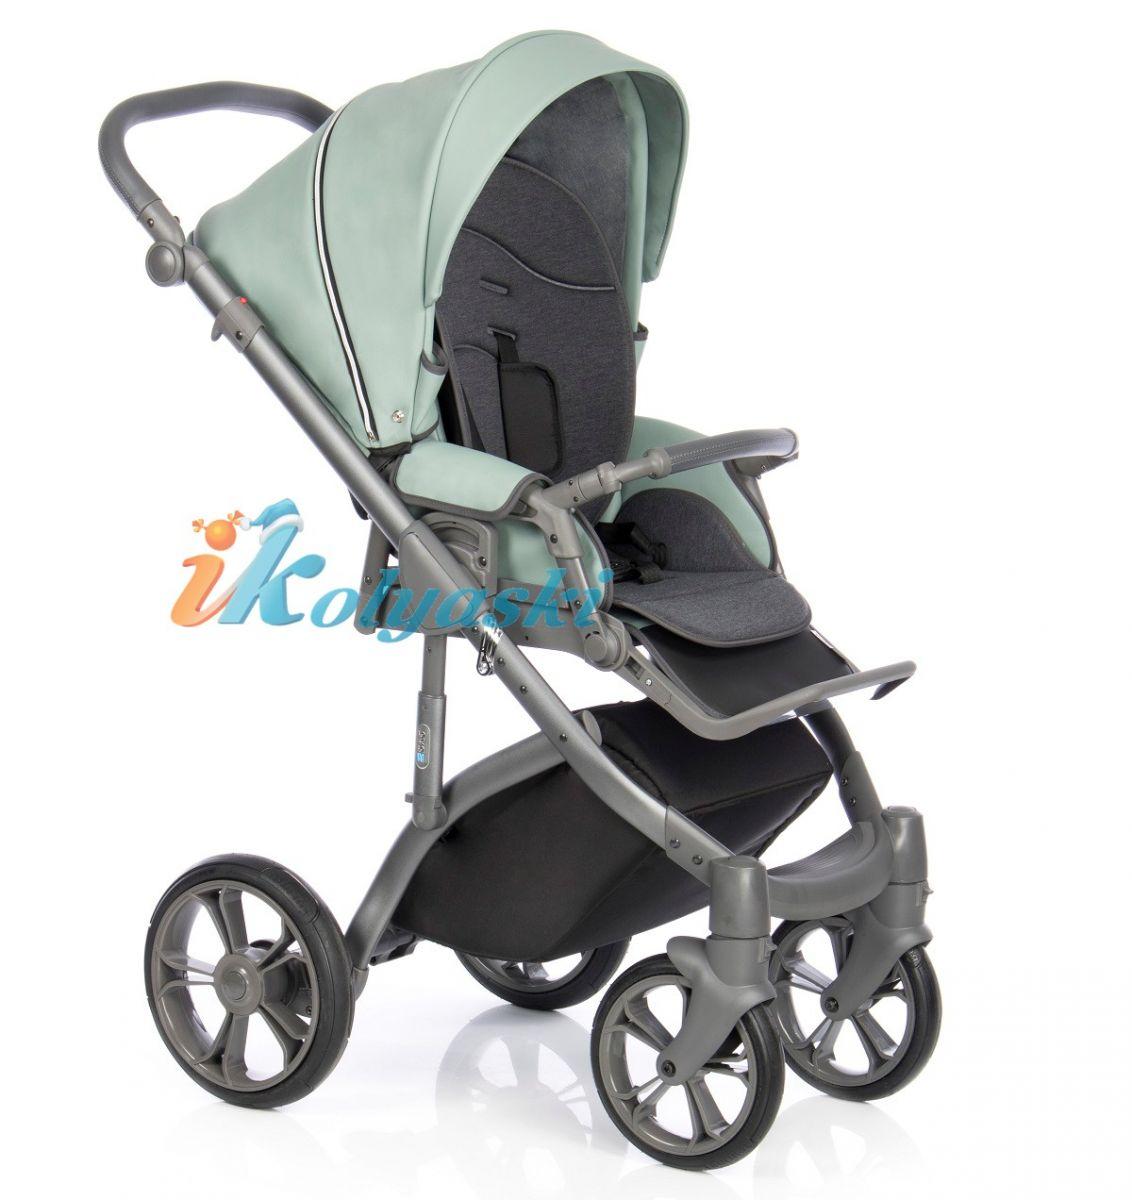 Roan Bass Soft Misty Mint Eco-Leather коляска для новорожденных новинка